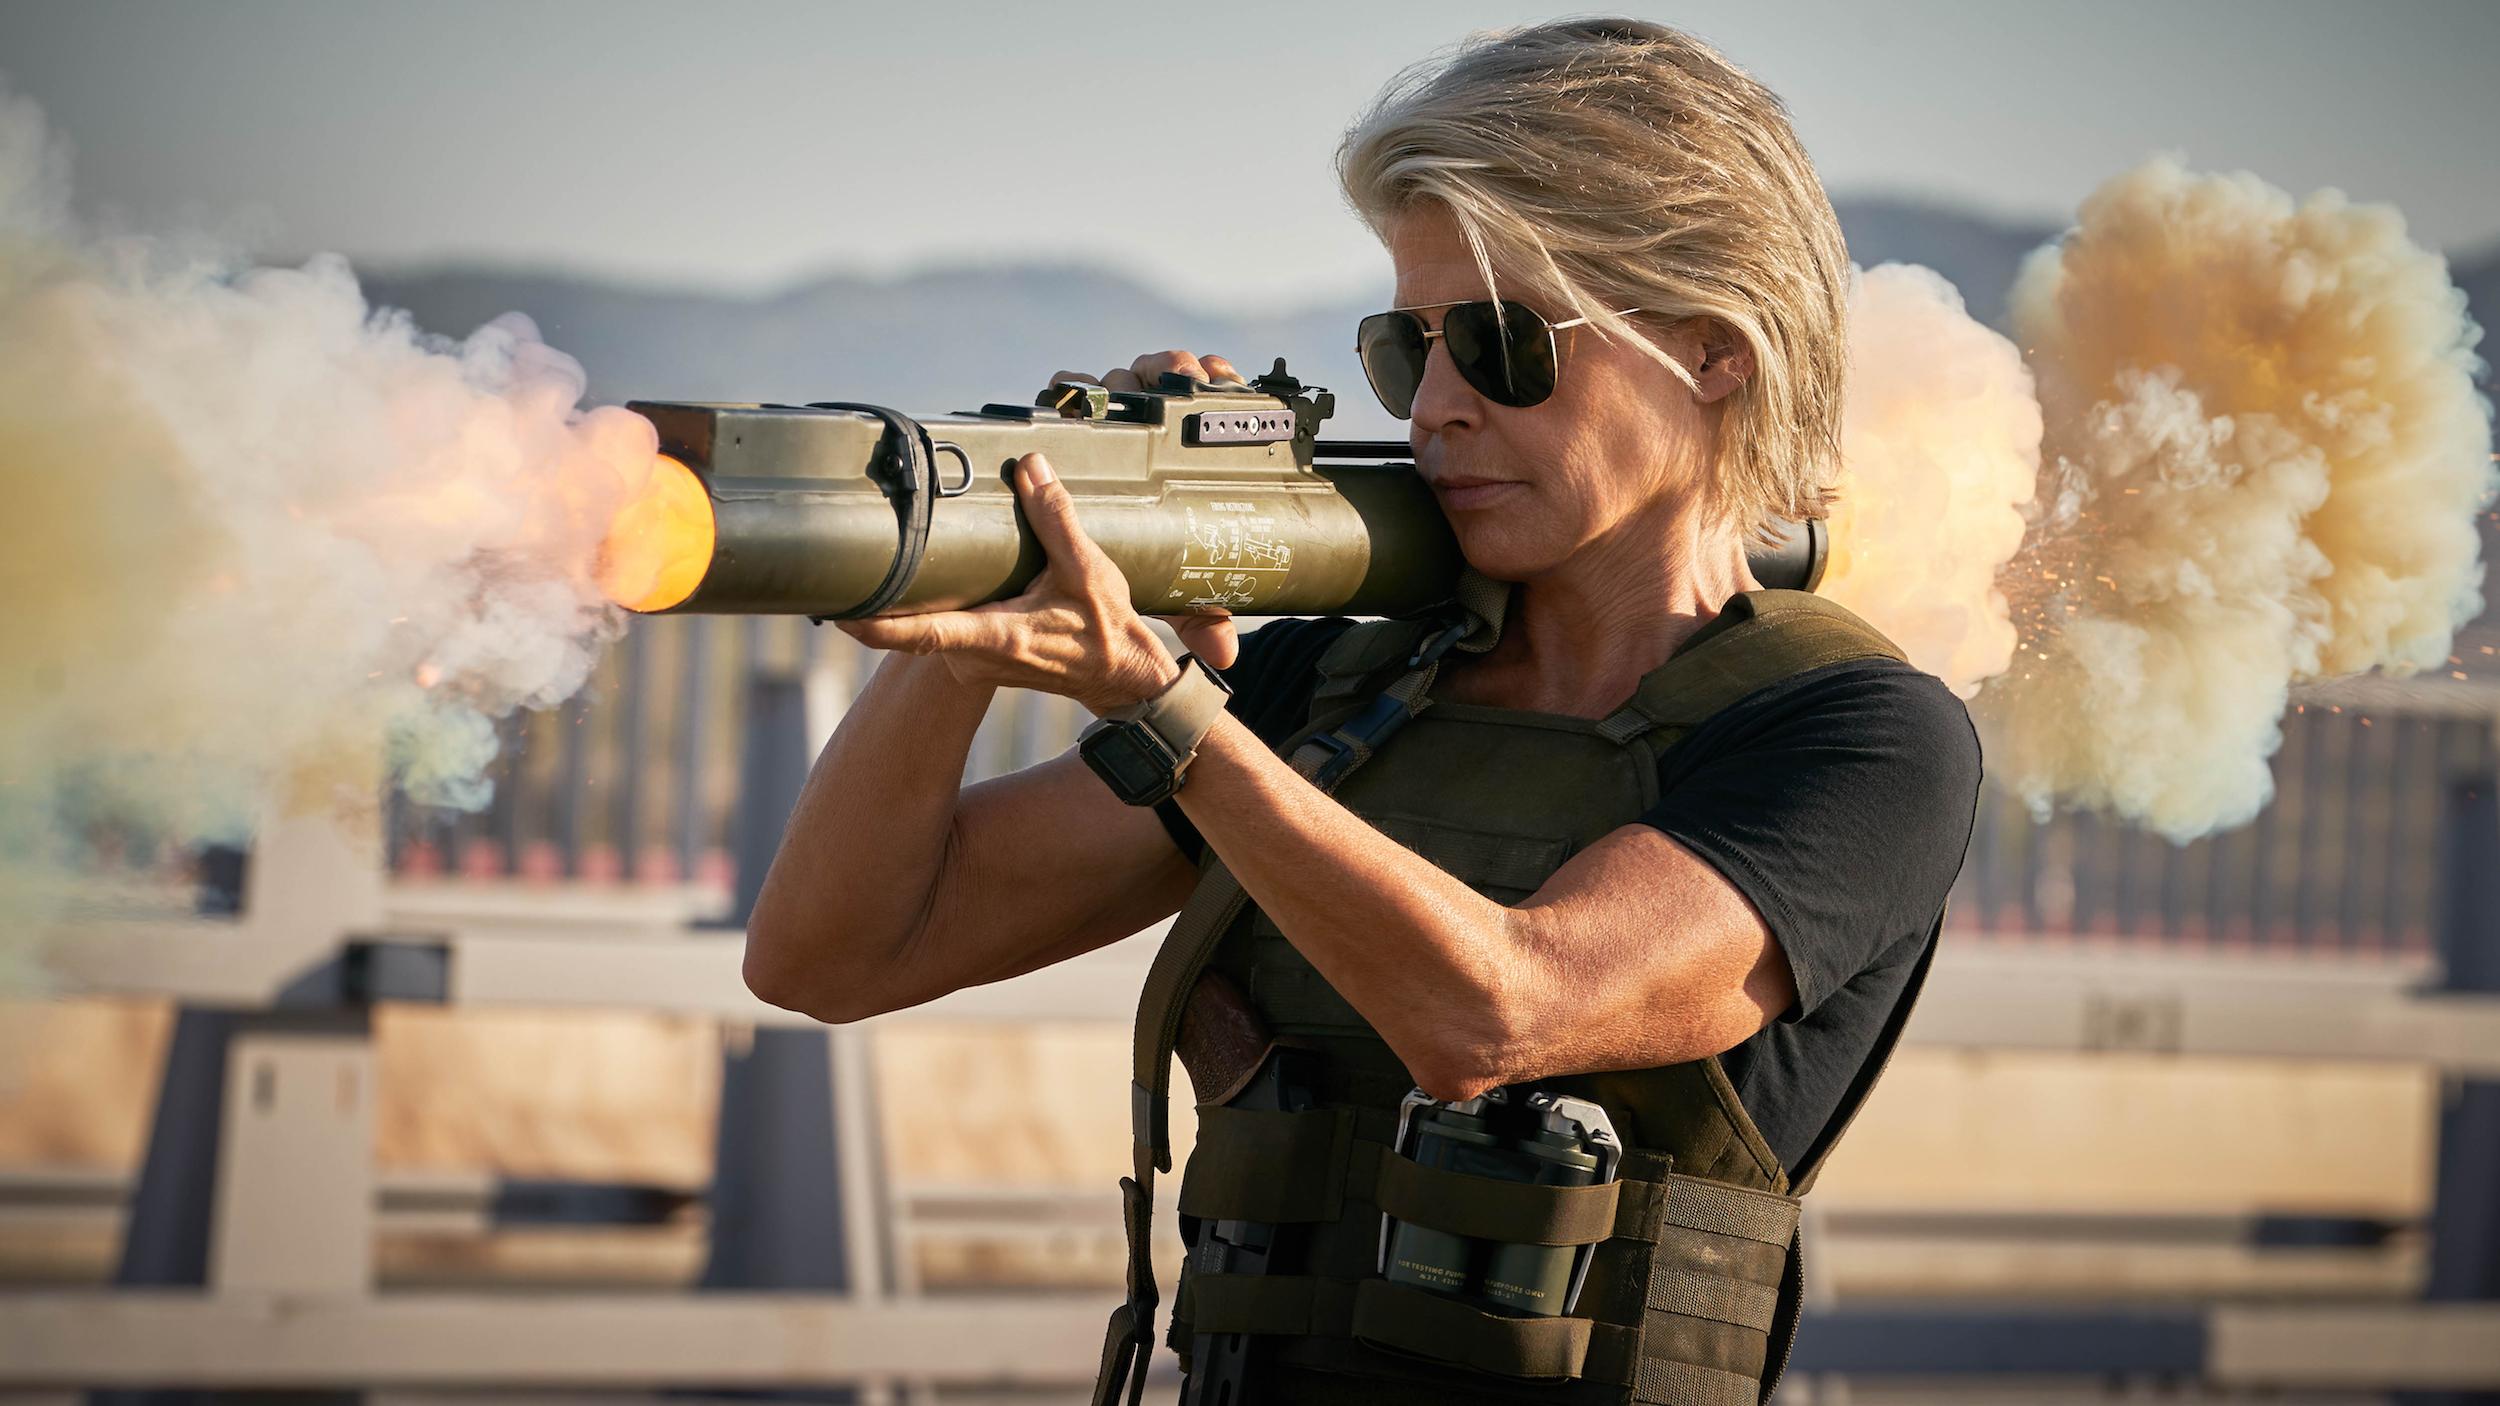 Terminator: Dark Fate at least gets Sarah Connor right